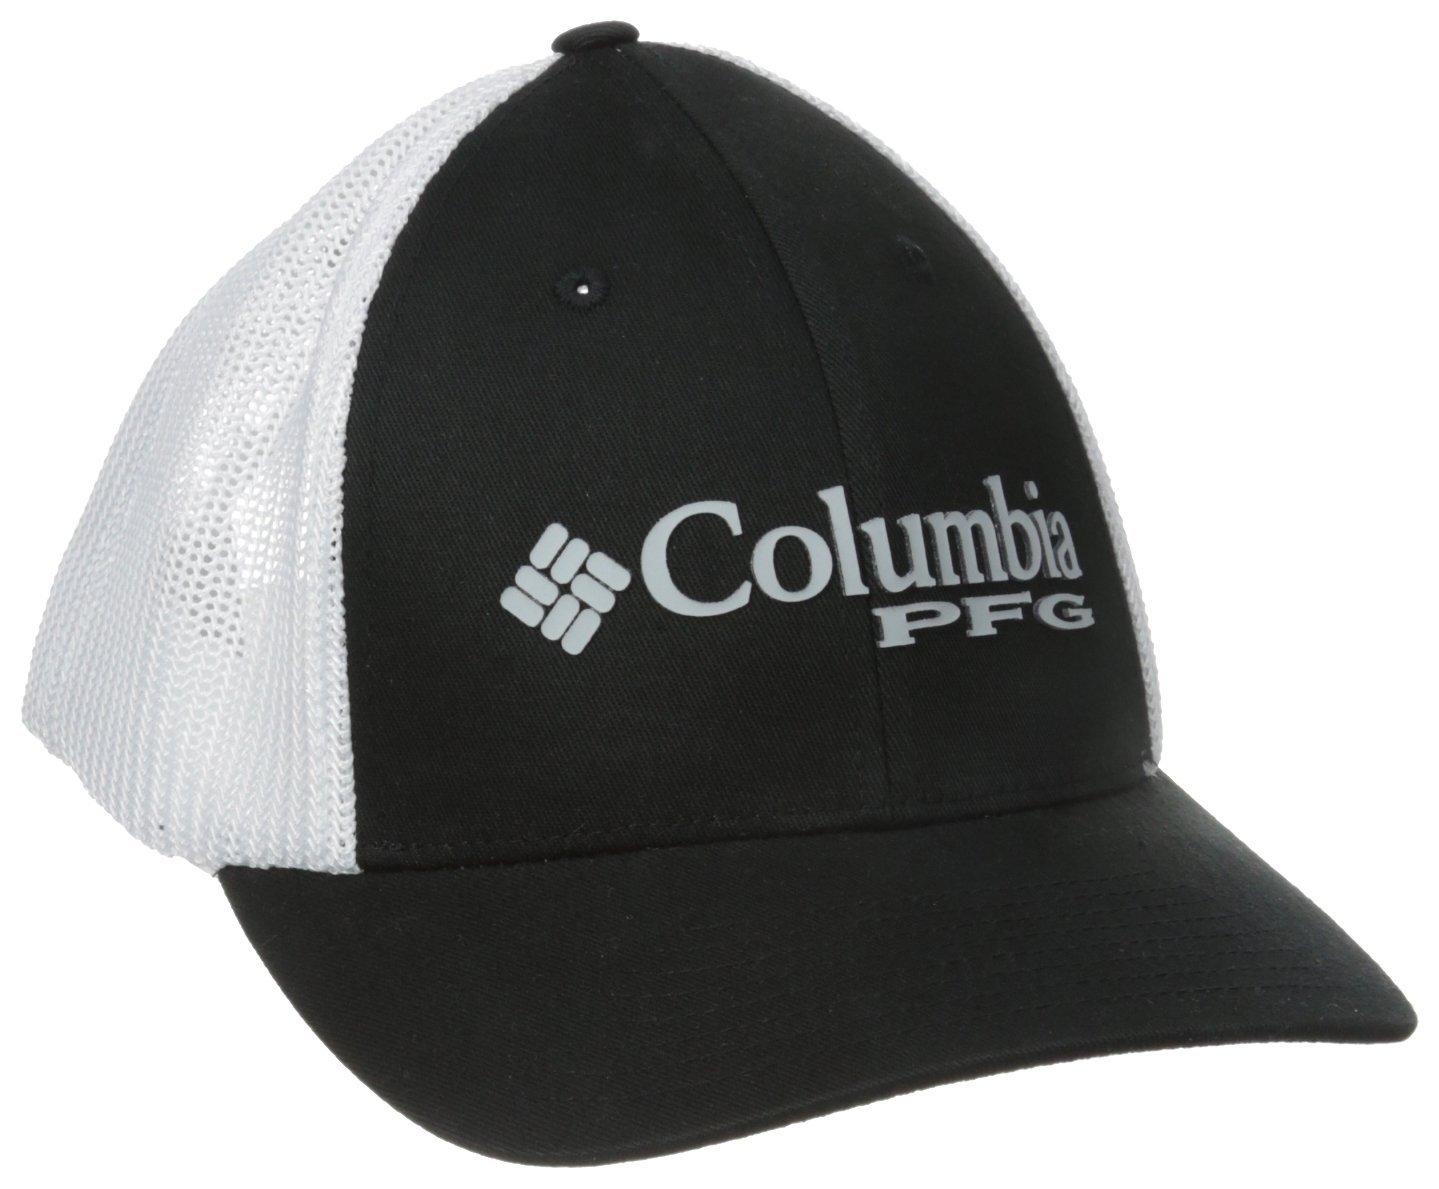 ed57b898507 Get Quotations · Columbia Men s PFG Mesh Snap Back Ball Cap